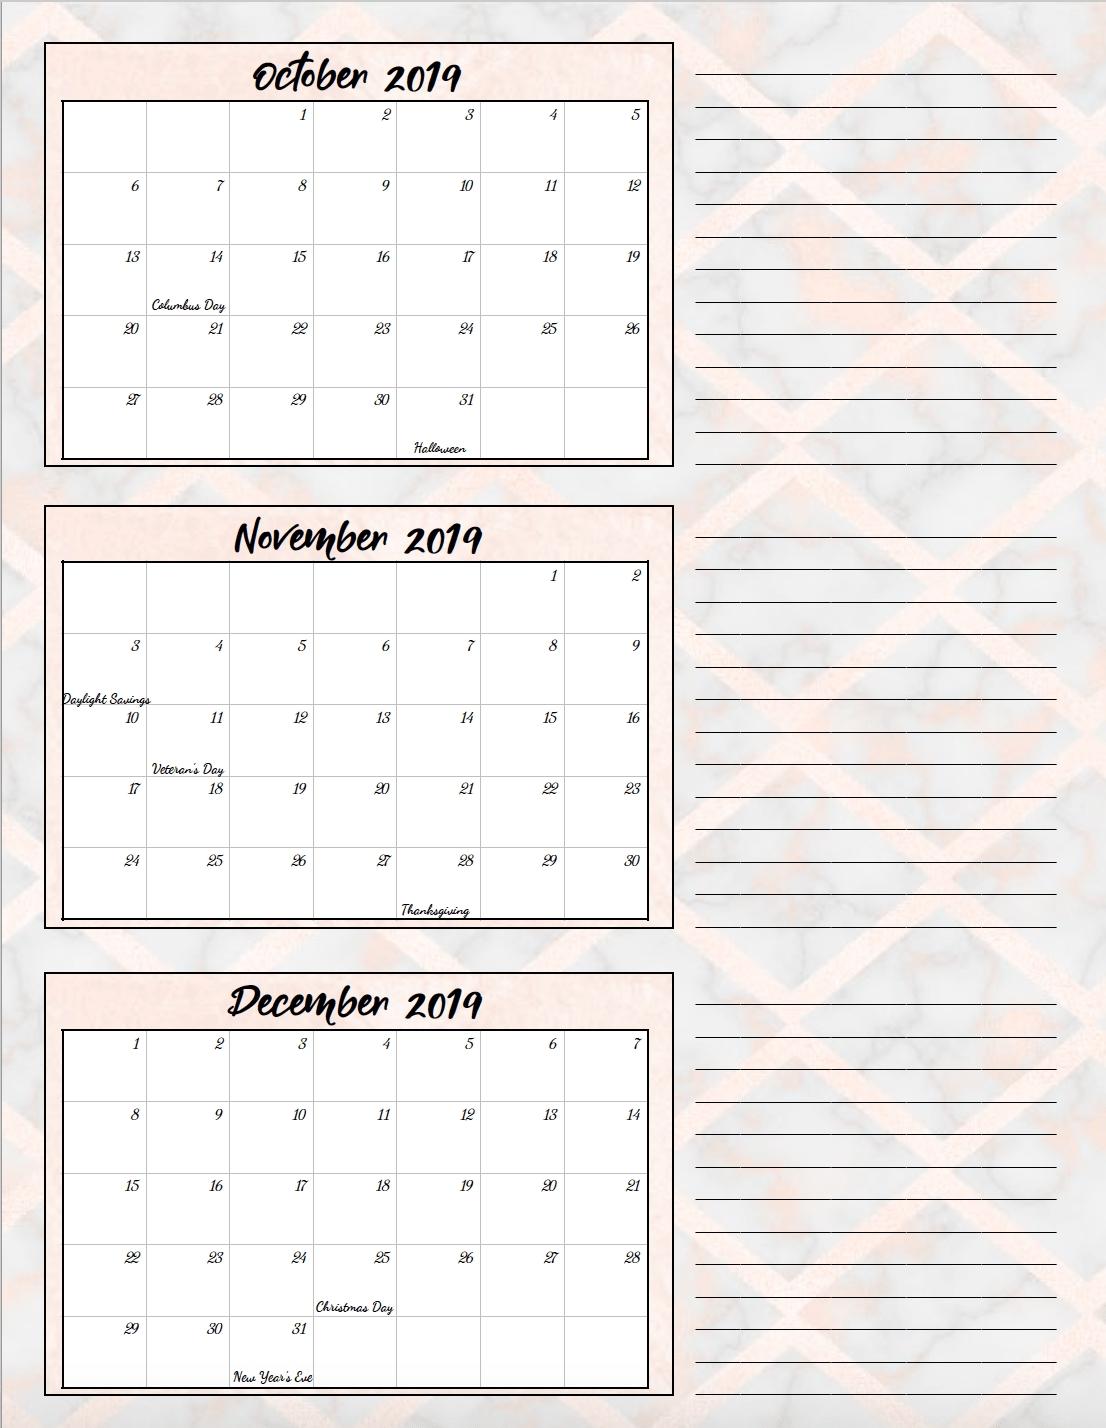 Free Printable 2019 Quarterly Calendars With Holidays: 3 Designs